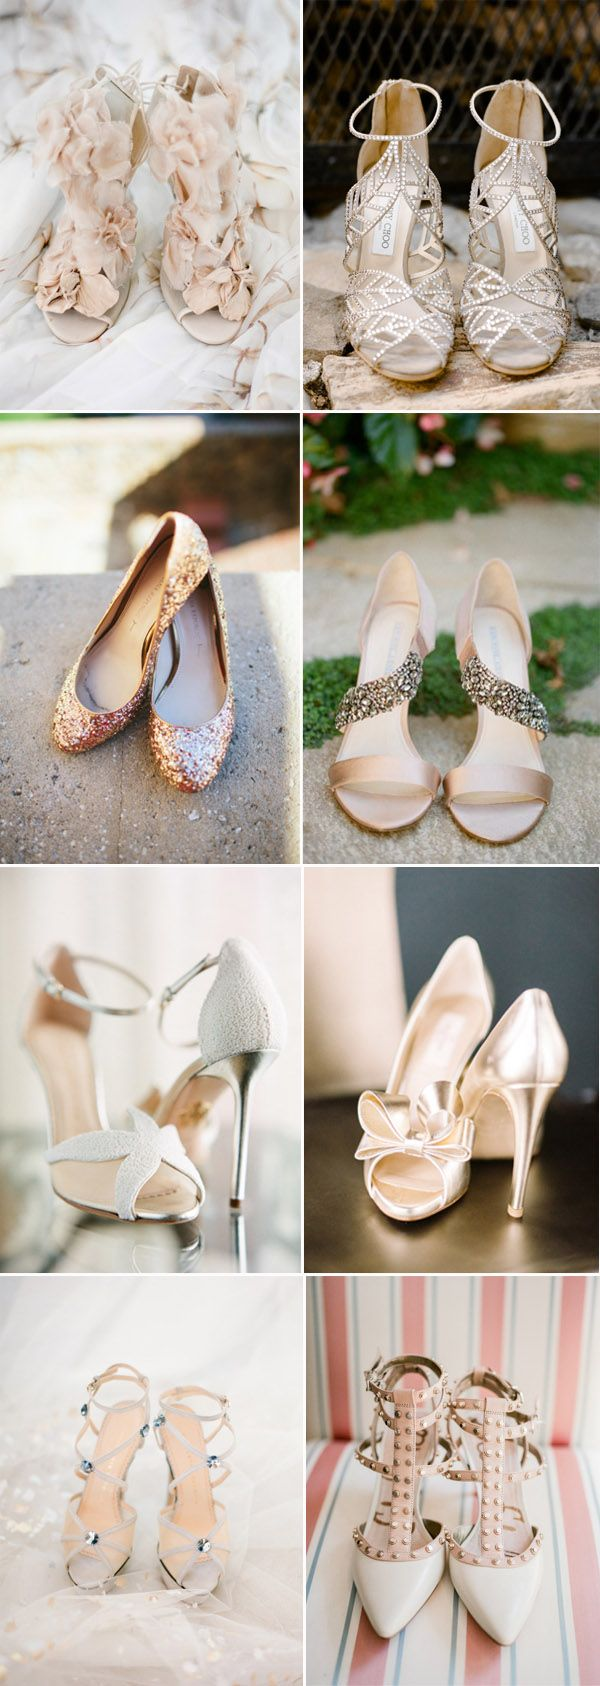 22 Unique Wedding Shoes Photo Ideas to Steal  Weddings  Marriage  Wedding shoes Unique